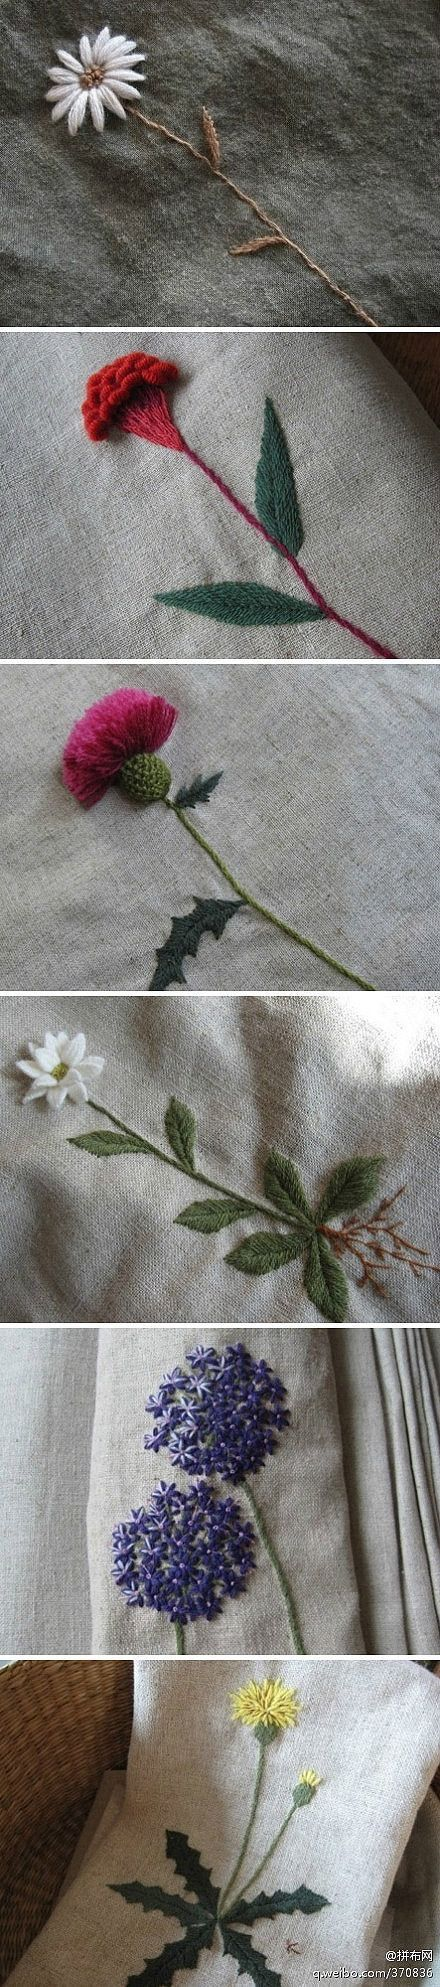 Feel flower blossom upon  you